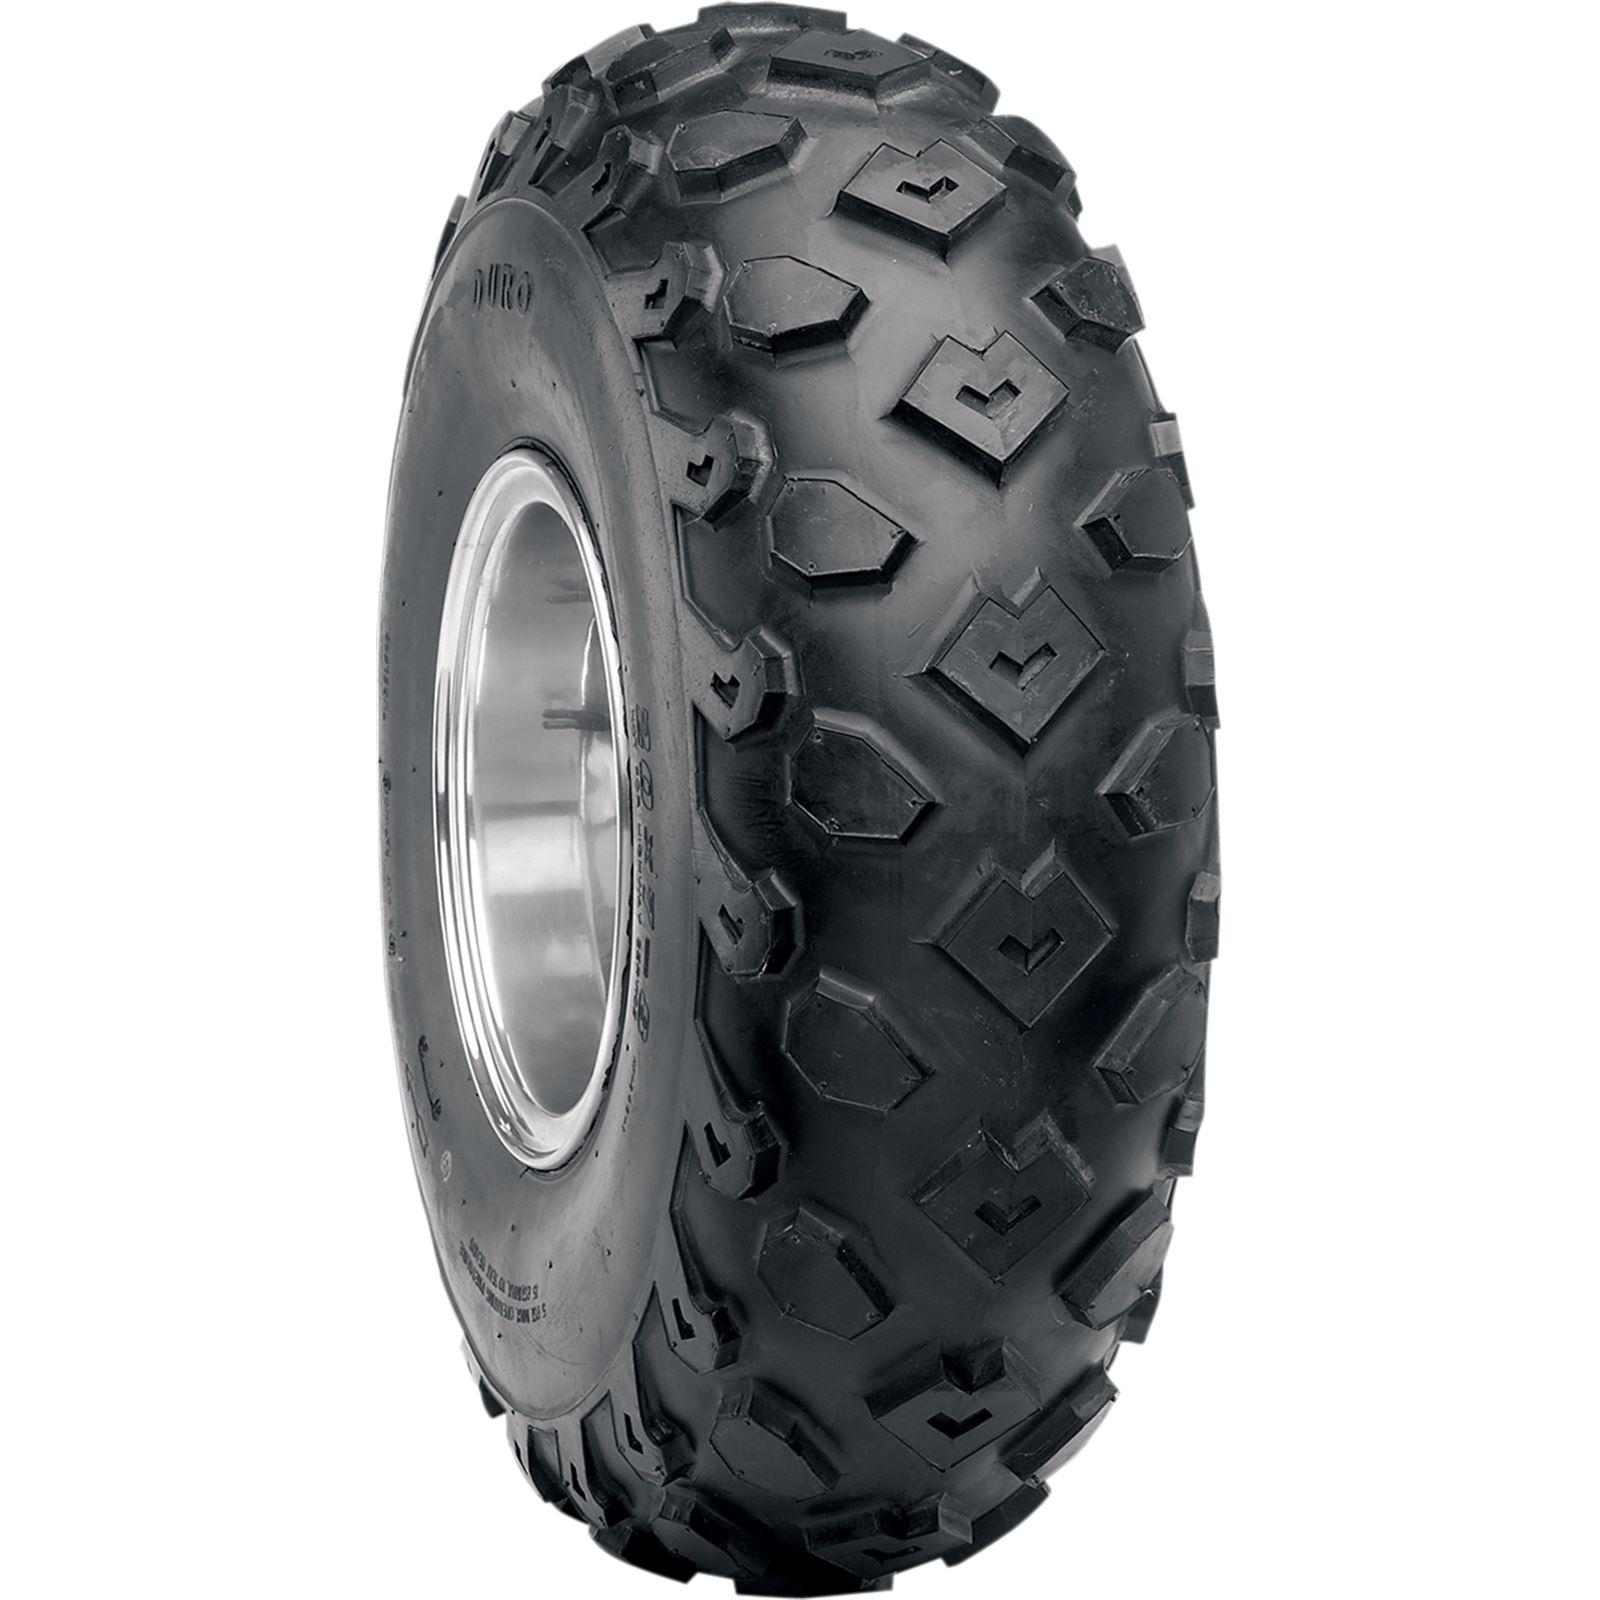 Duro Tire HF246 - 19X7-8 - 2 Ply